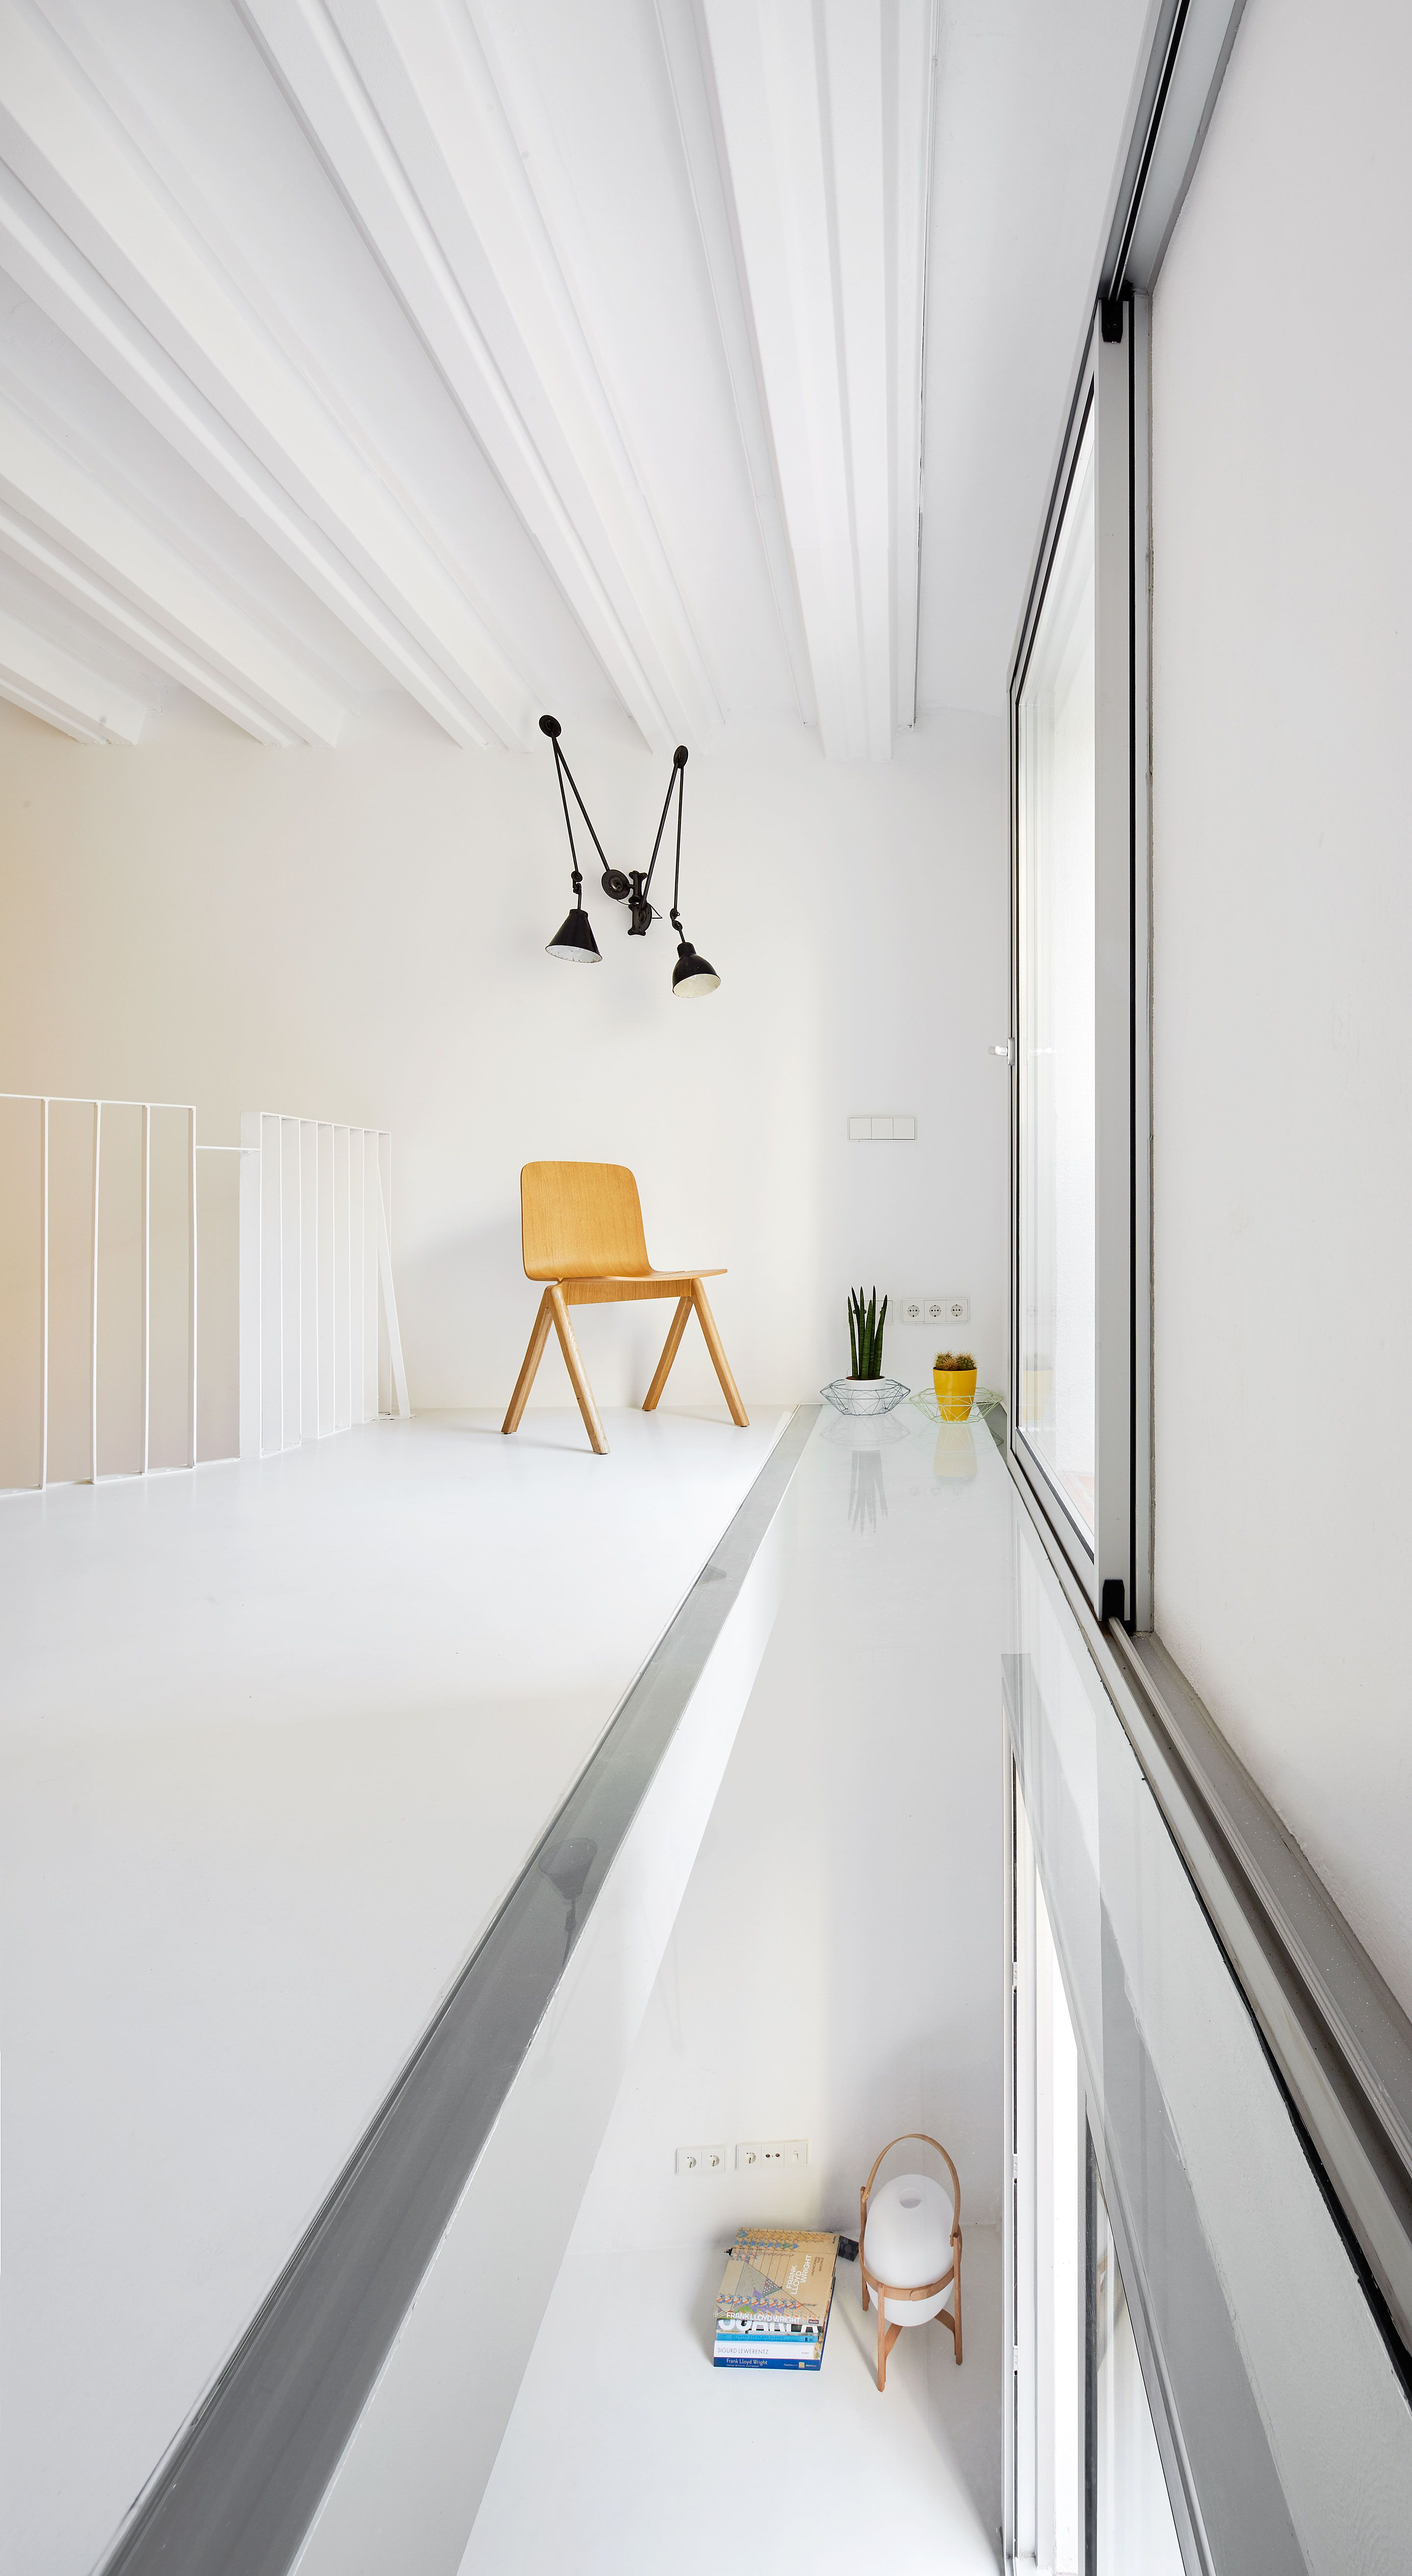 Duplex tibbaut mezzanine floor mezzanine and ground floor